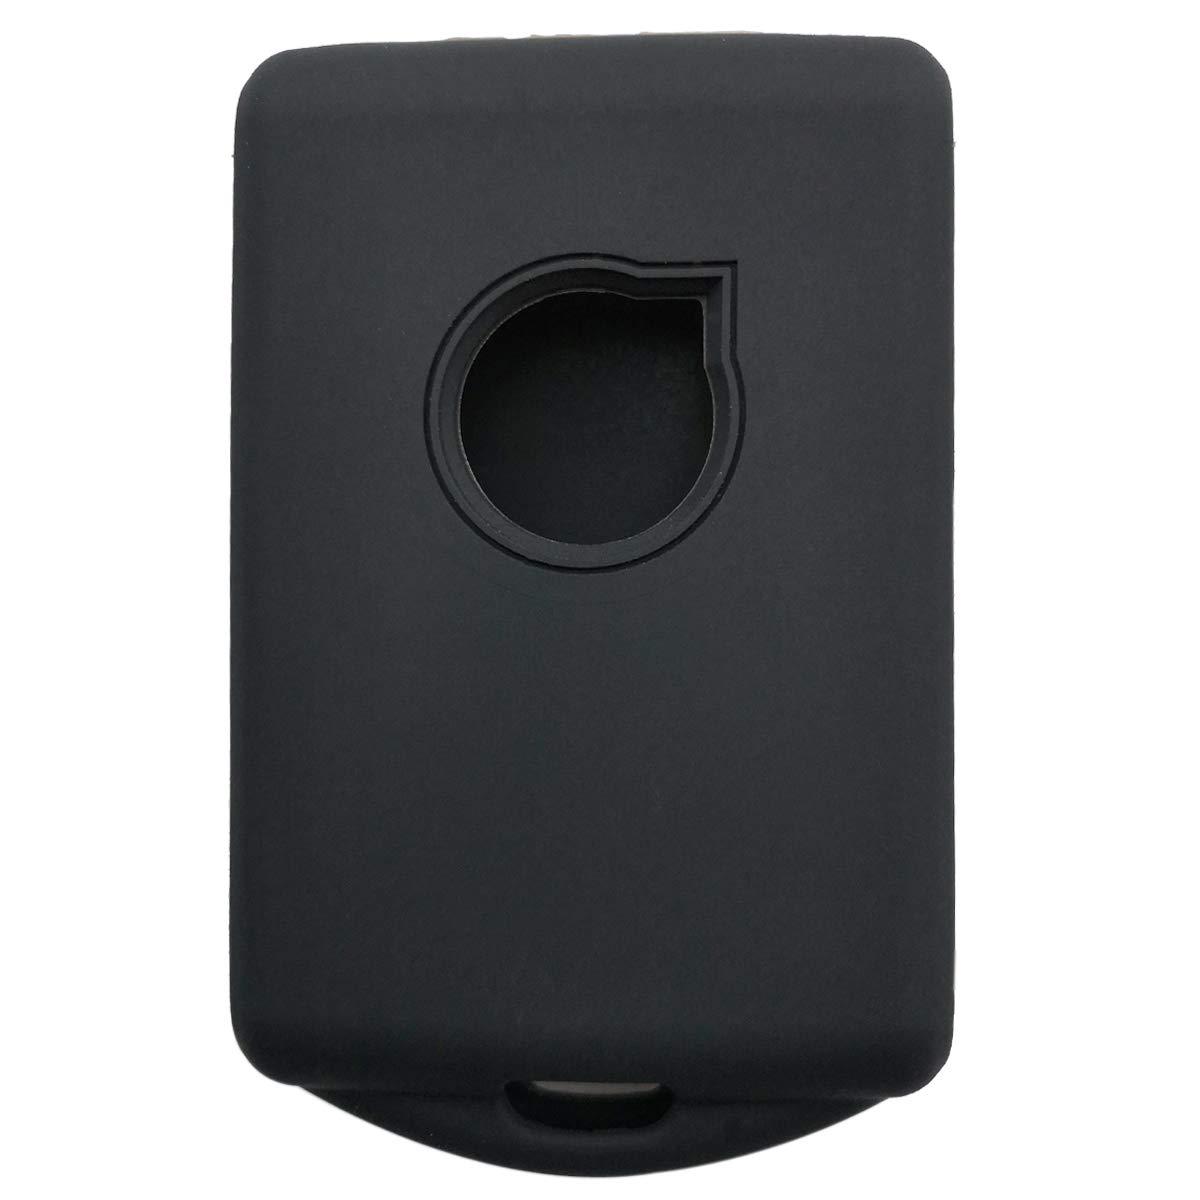 Coolbestda - Funda para Llave de Coche para Volvo XC90 XC70 S60 S80 S90 C30 V70 V90 YGOHUF8423